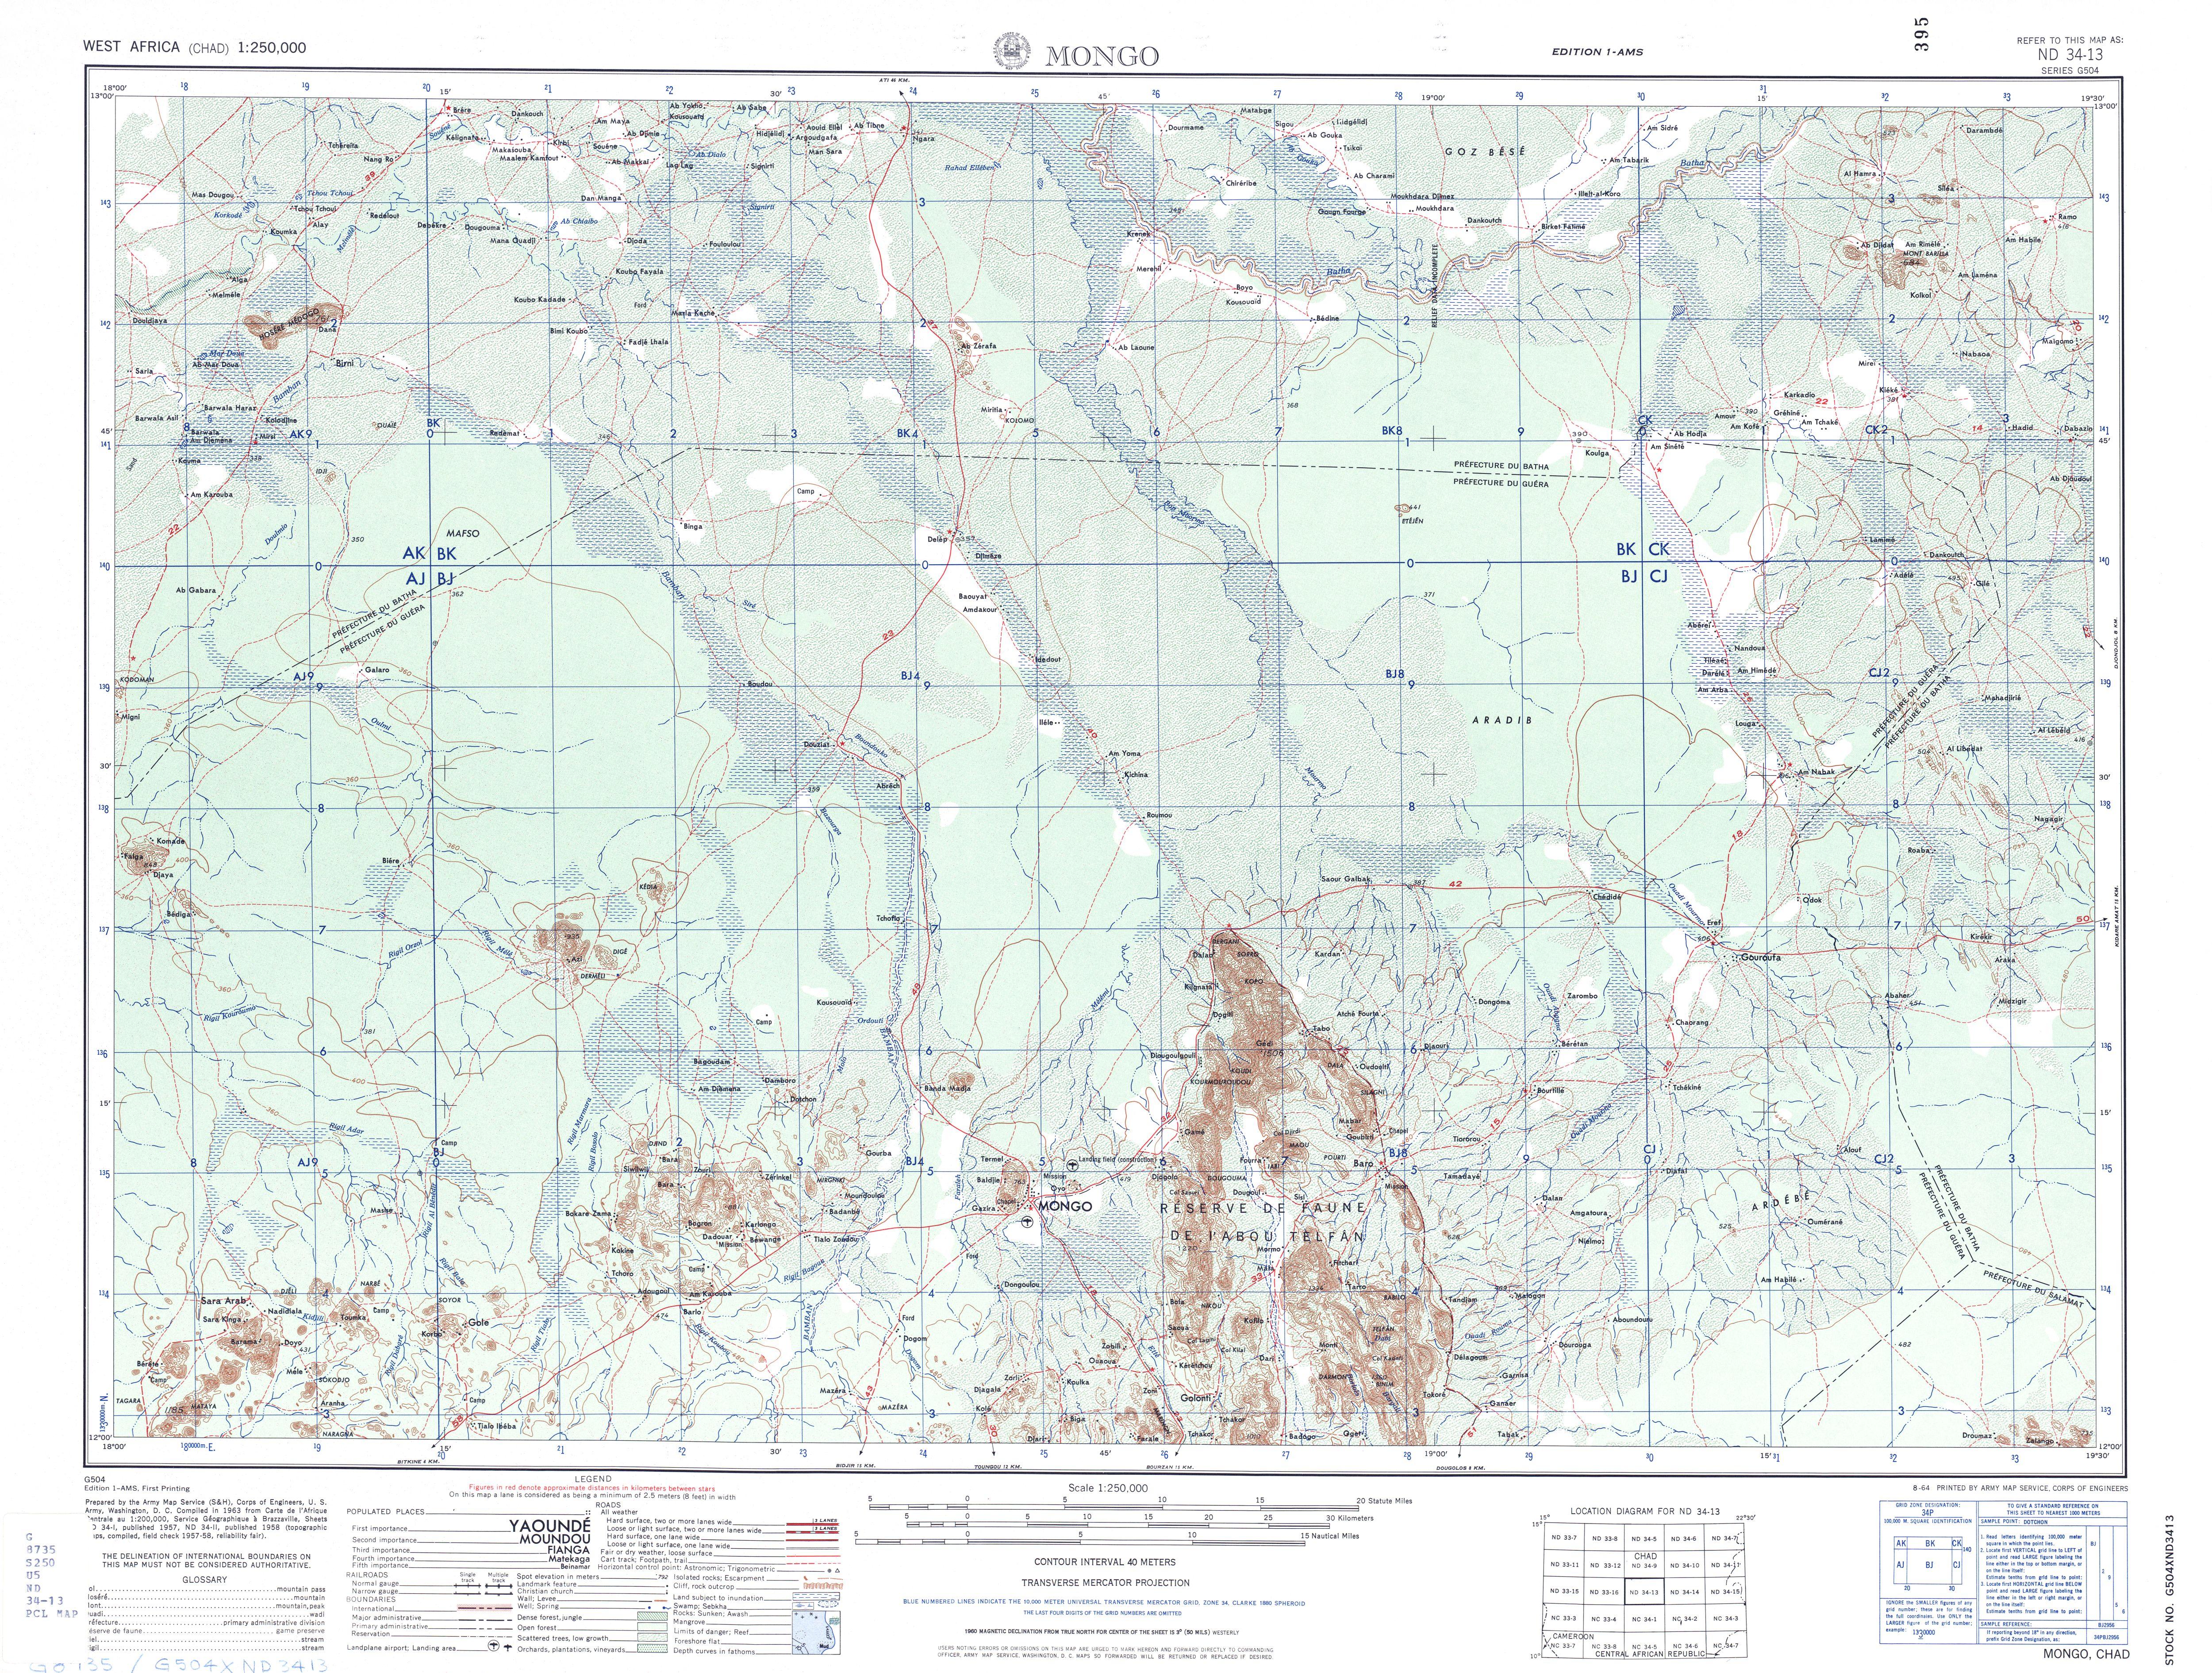 Mongo Topographic Map Sheet, Western Africa 1955